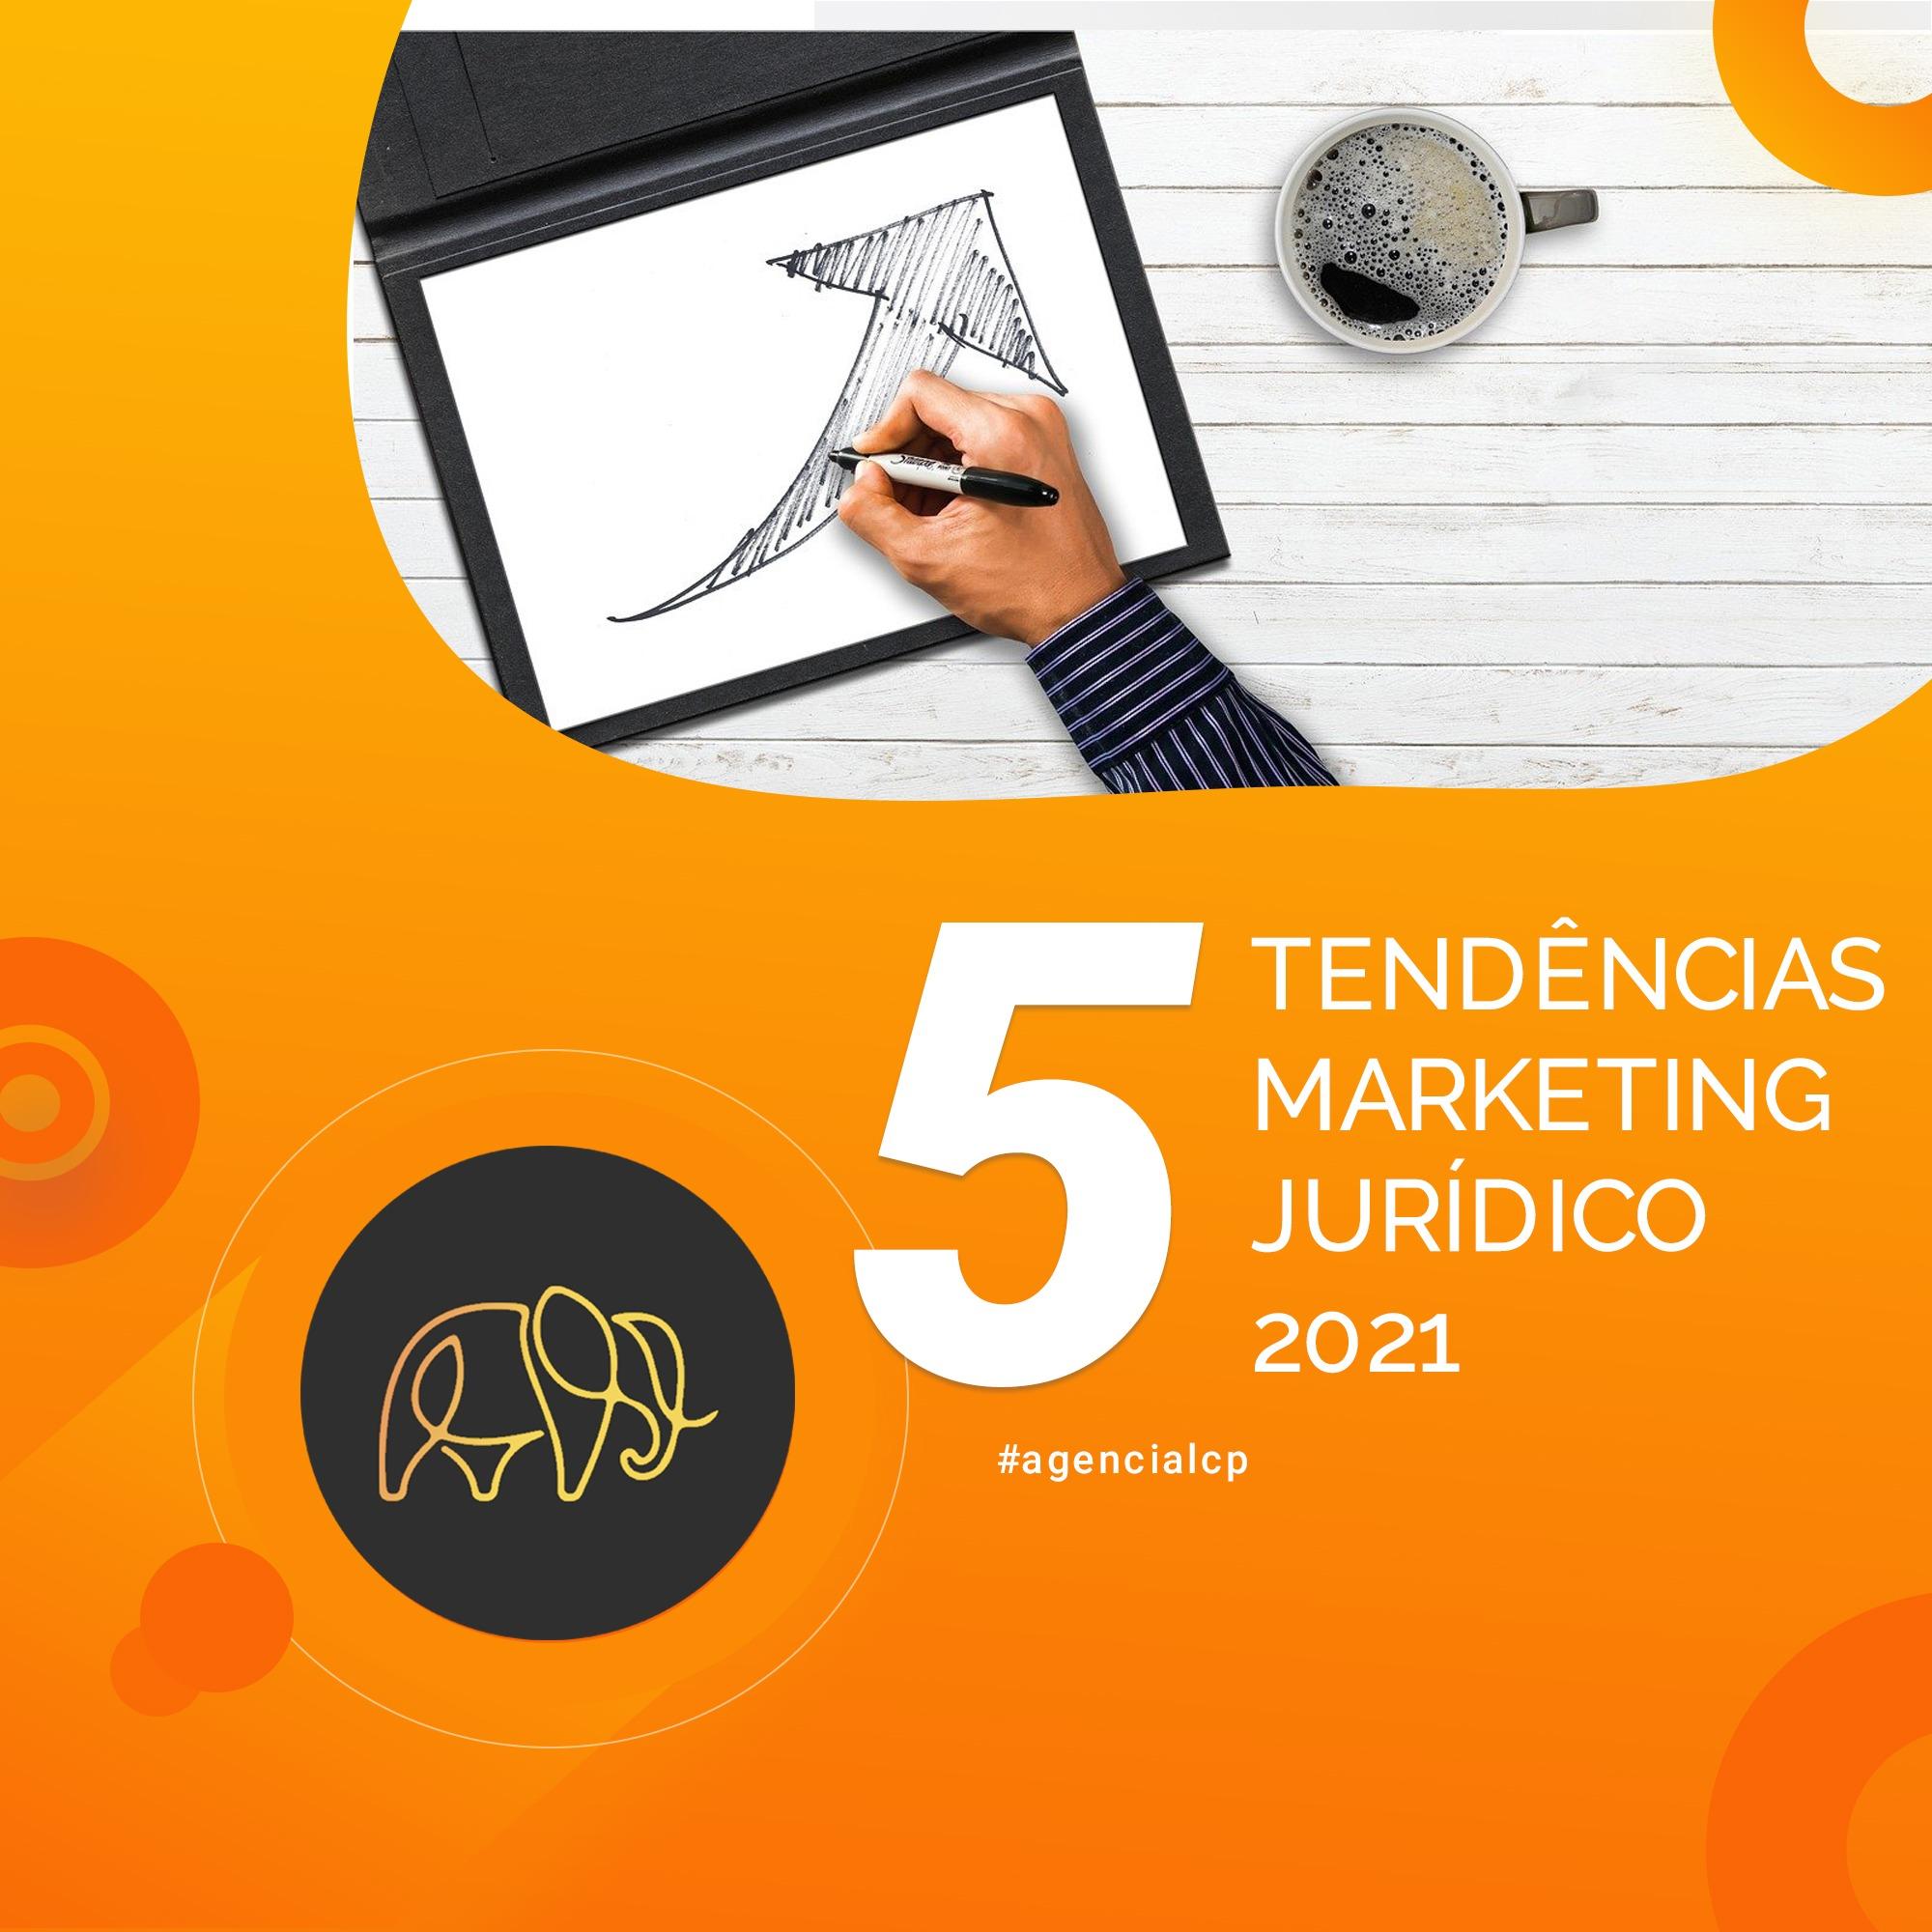 5 Tendências do Marketing Jurídico para 2021